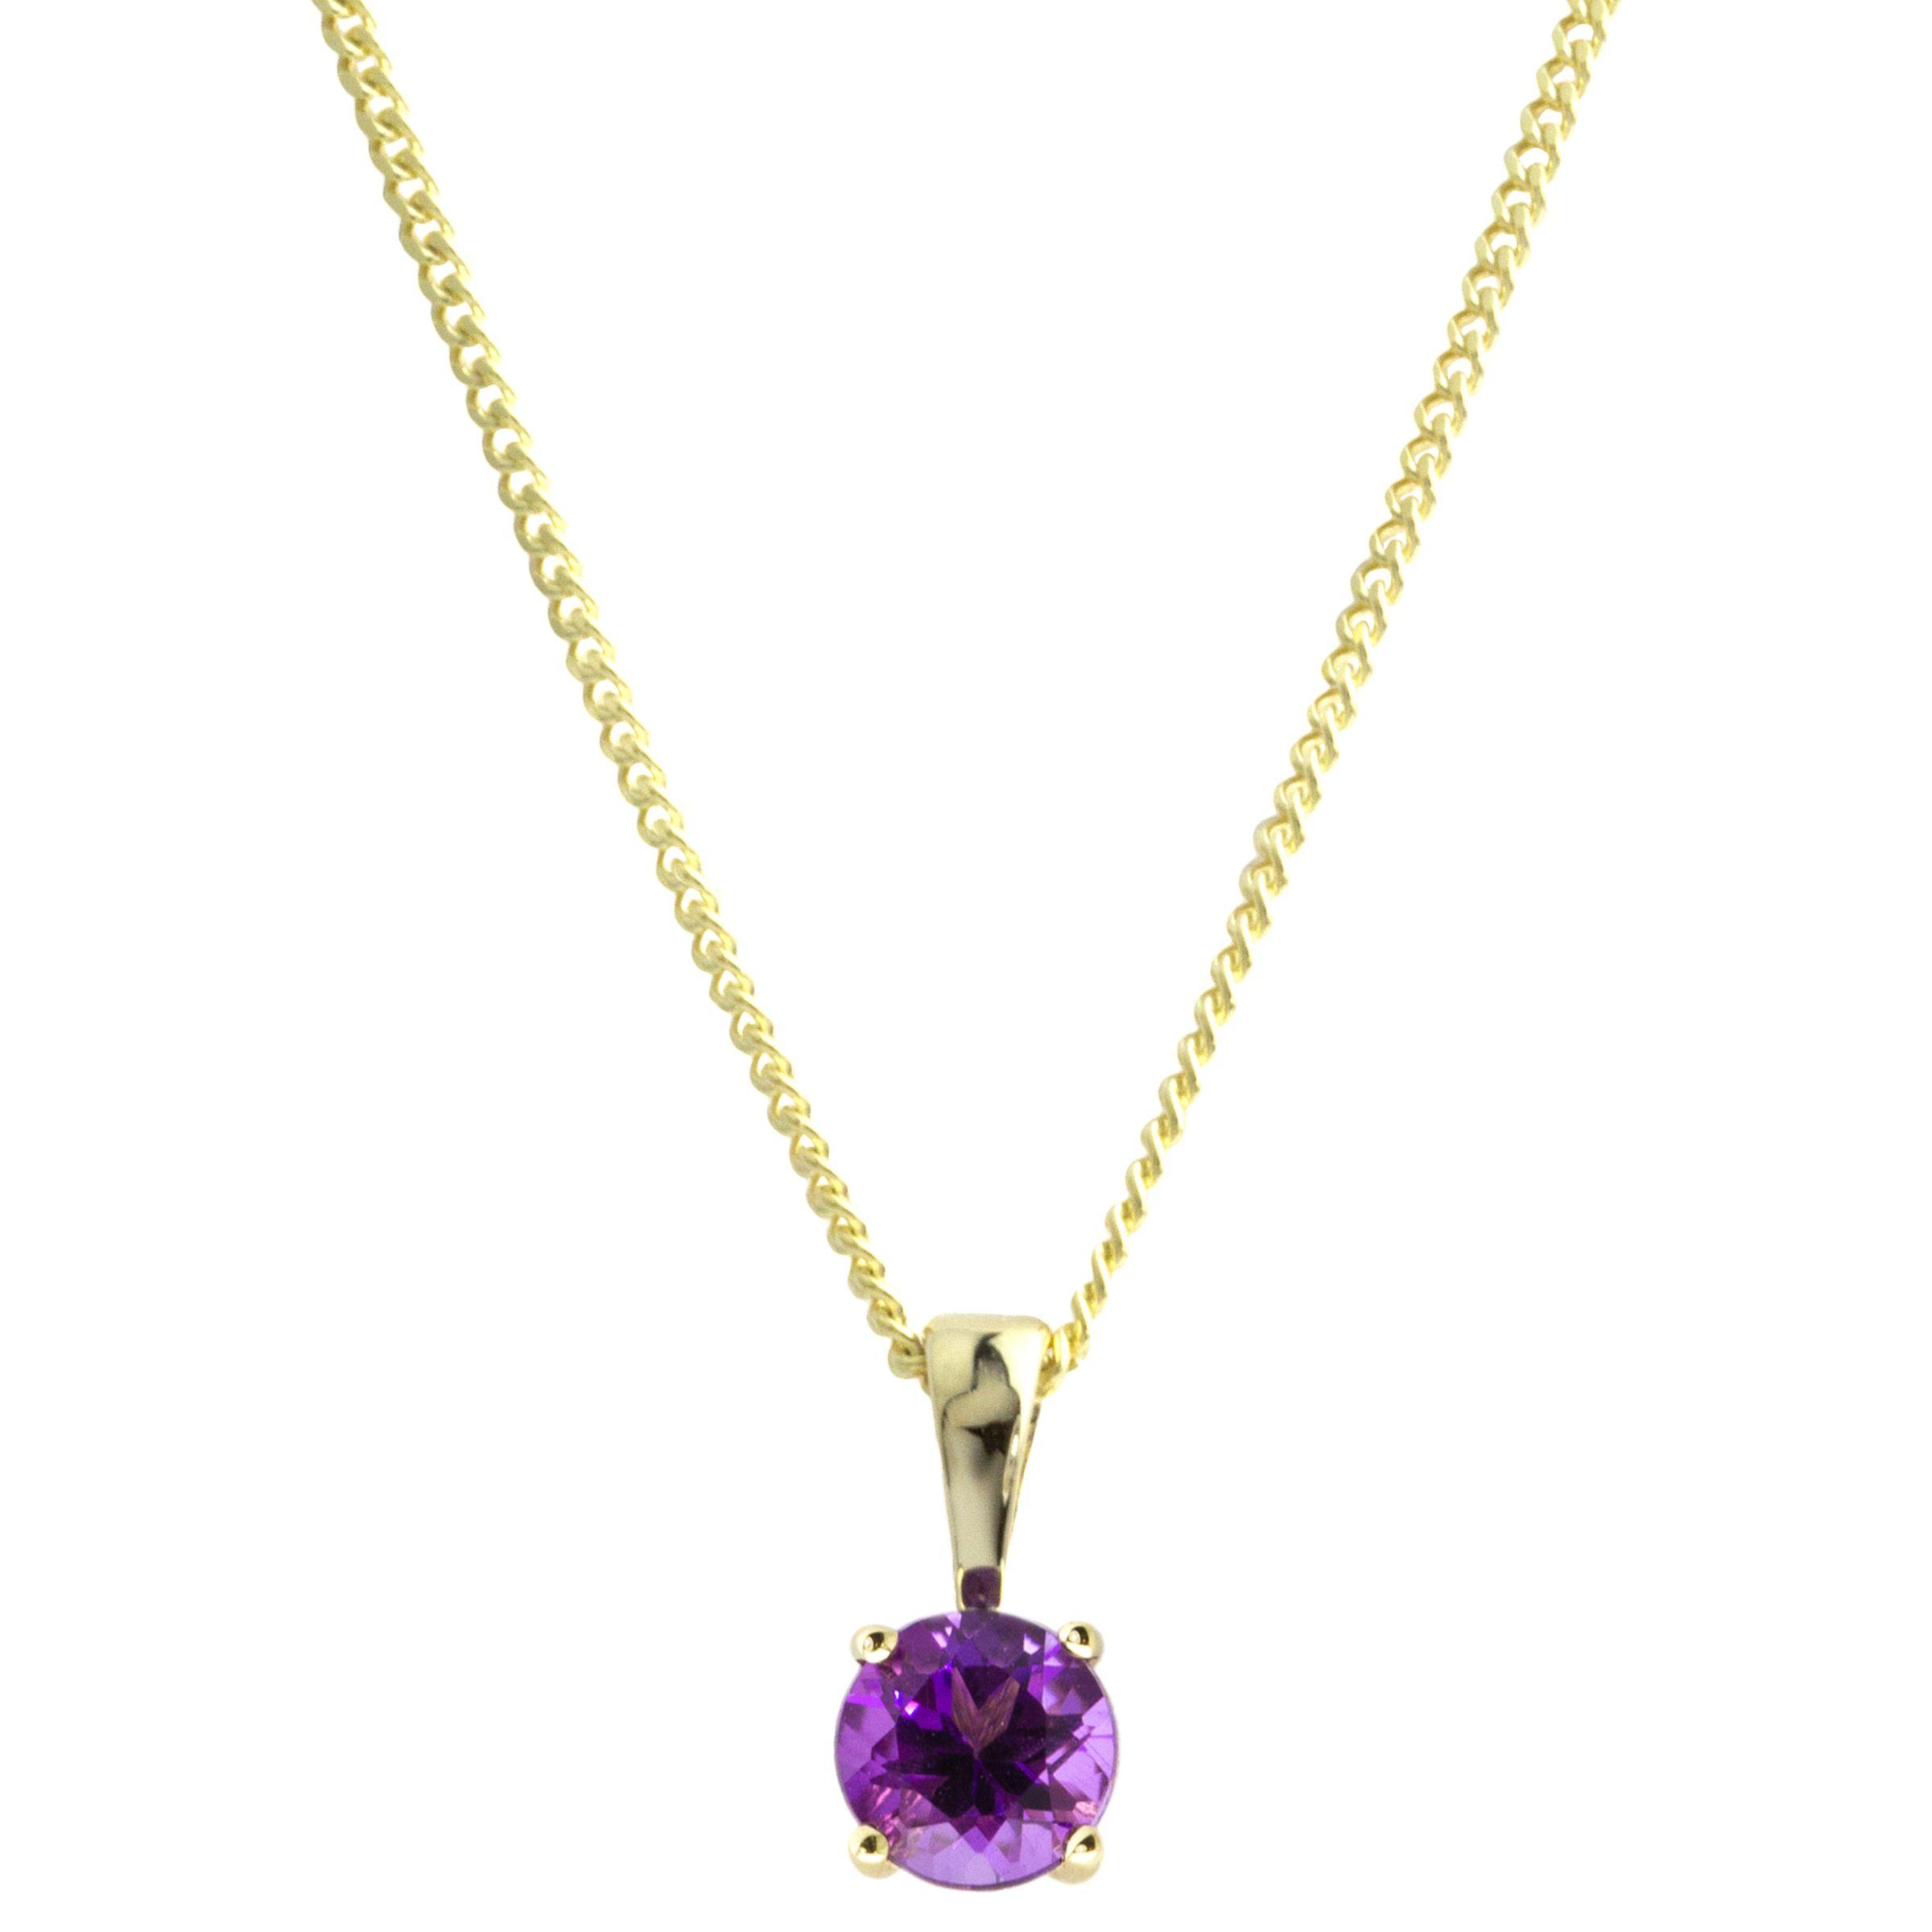 A B Davis A B Davis 9ct Gold Round Amethyst Pendant Necklace, Purple